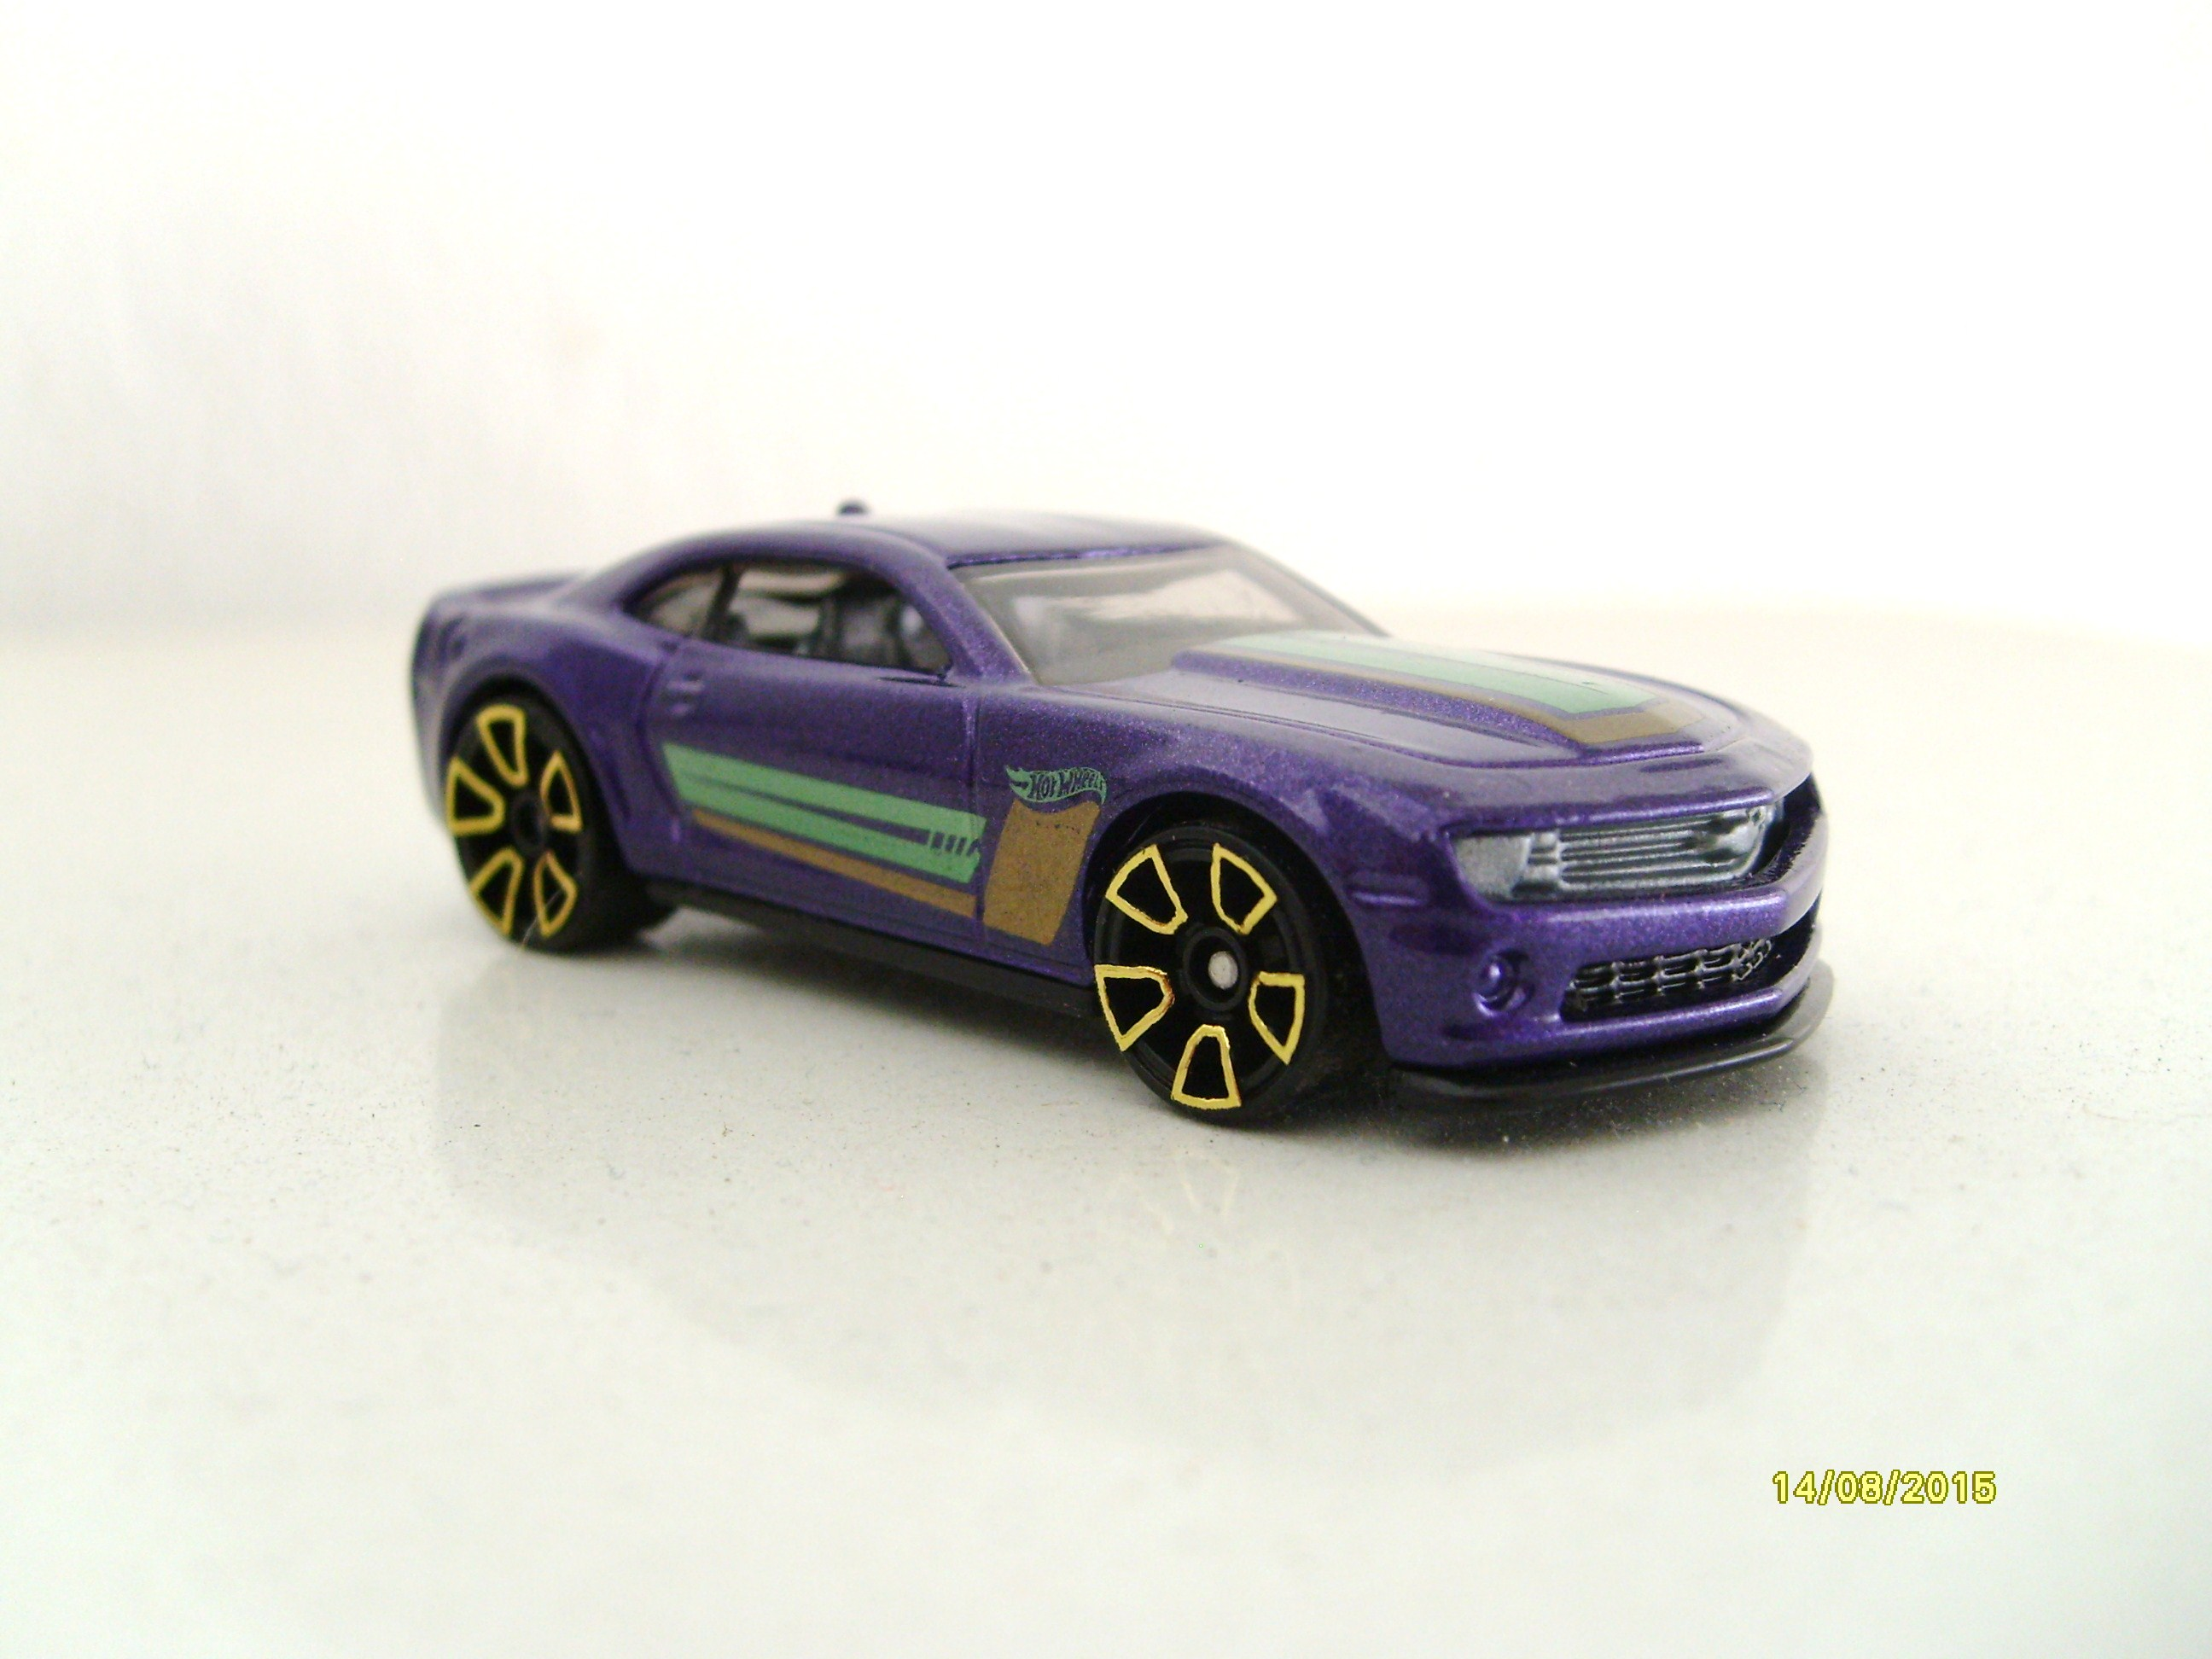 2013 Hot Wheels Chevy Camaro Special Edition Wiki Hotwheels 15 Mercedes Amg Gt Hitam Base Codes H17